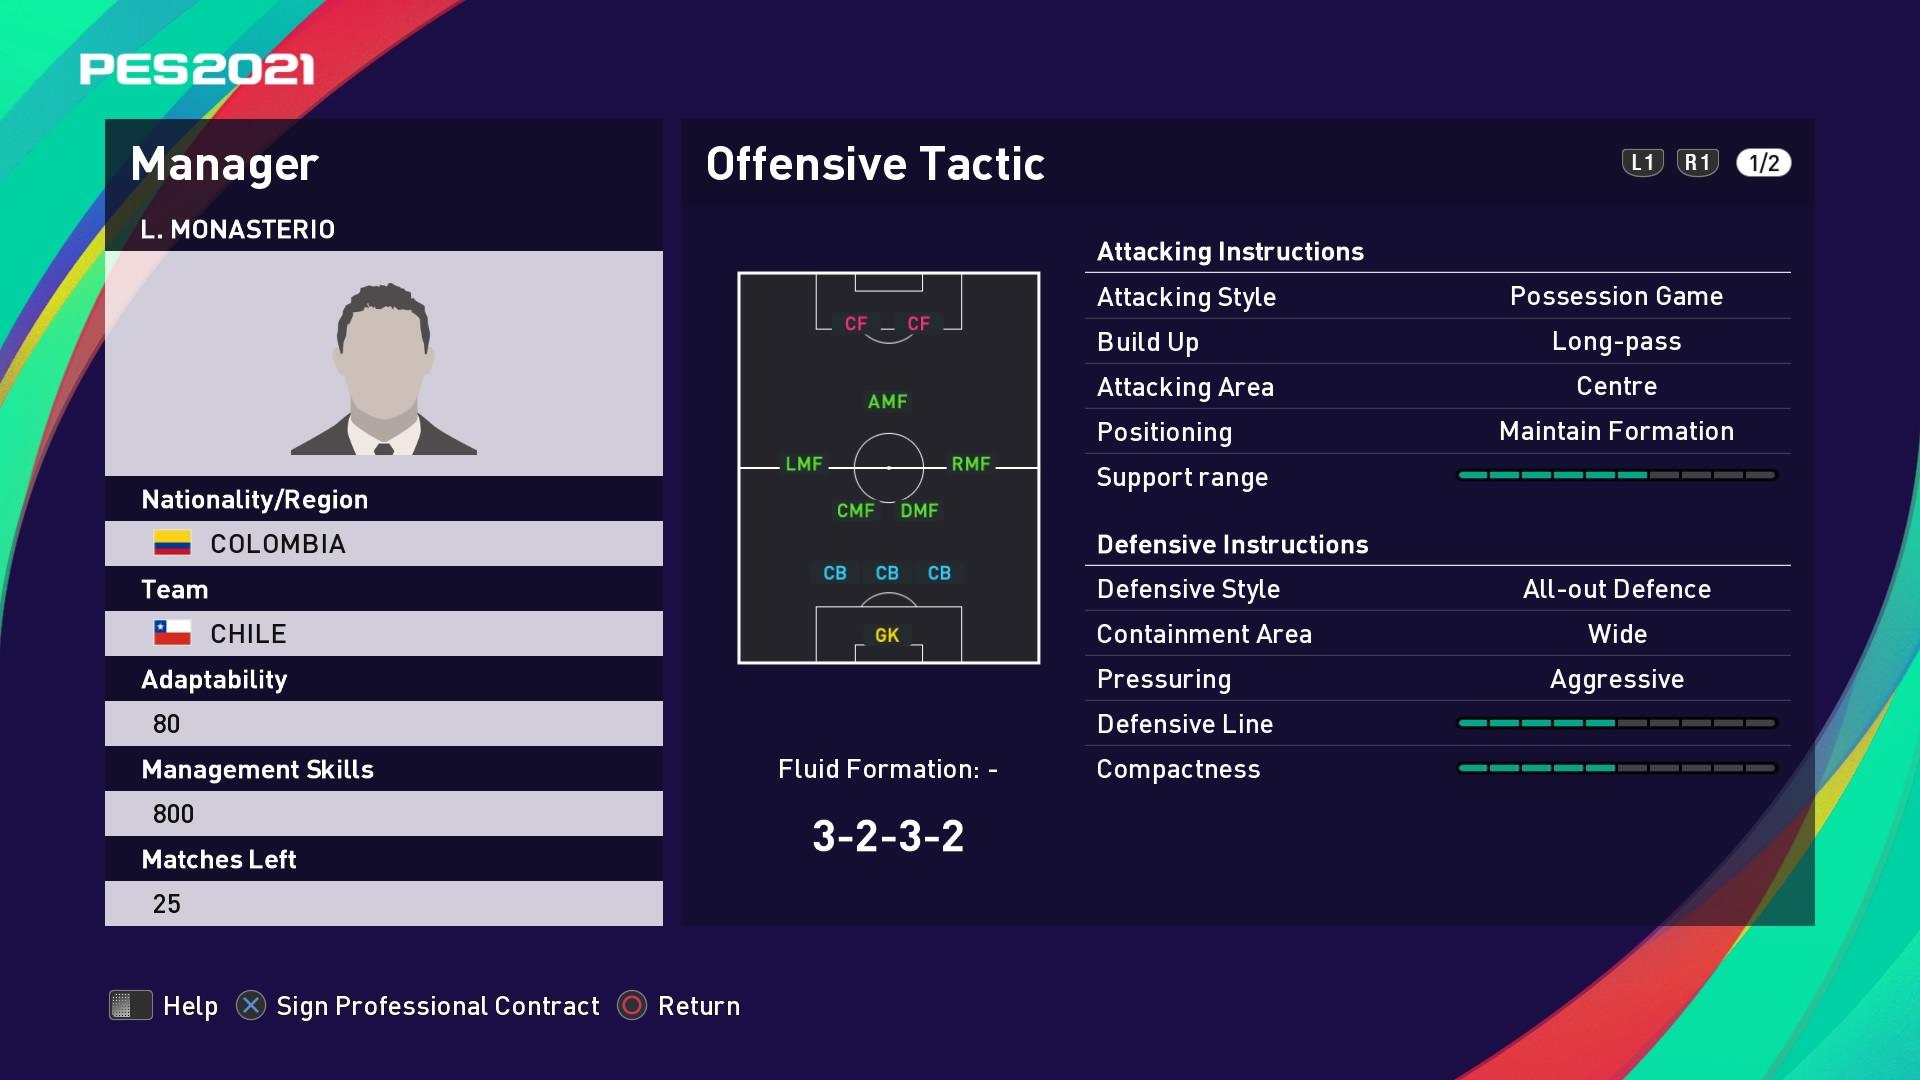 L. Monasterio (Reinaldo Rueda) Offensive Tactic in PES 2021 myClub